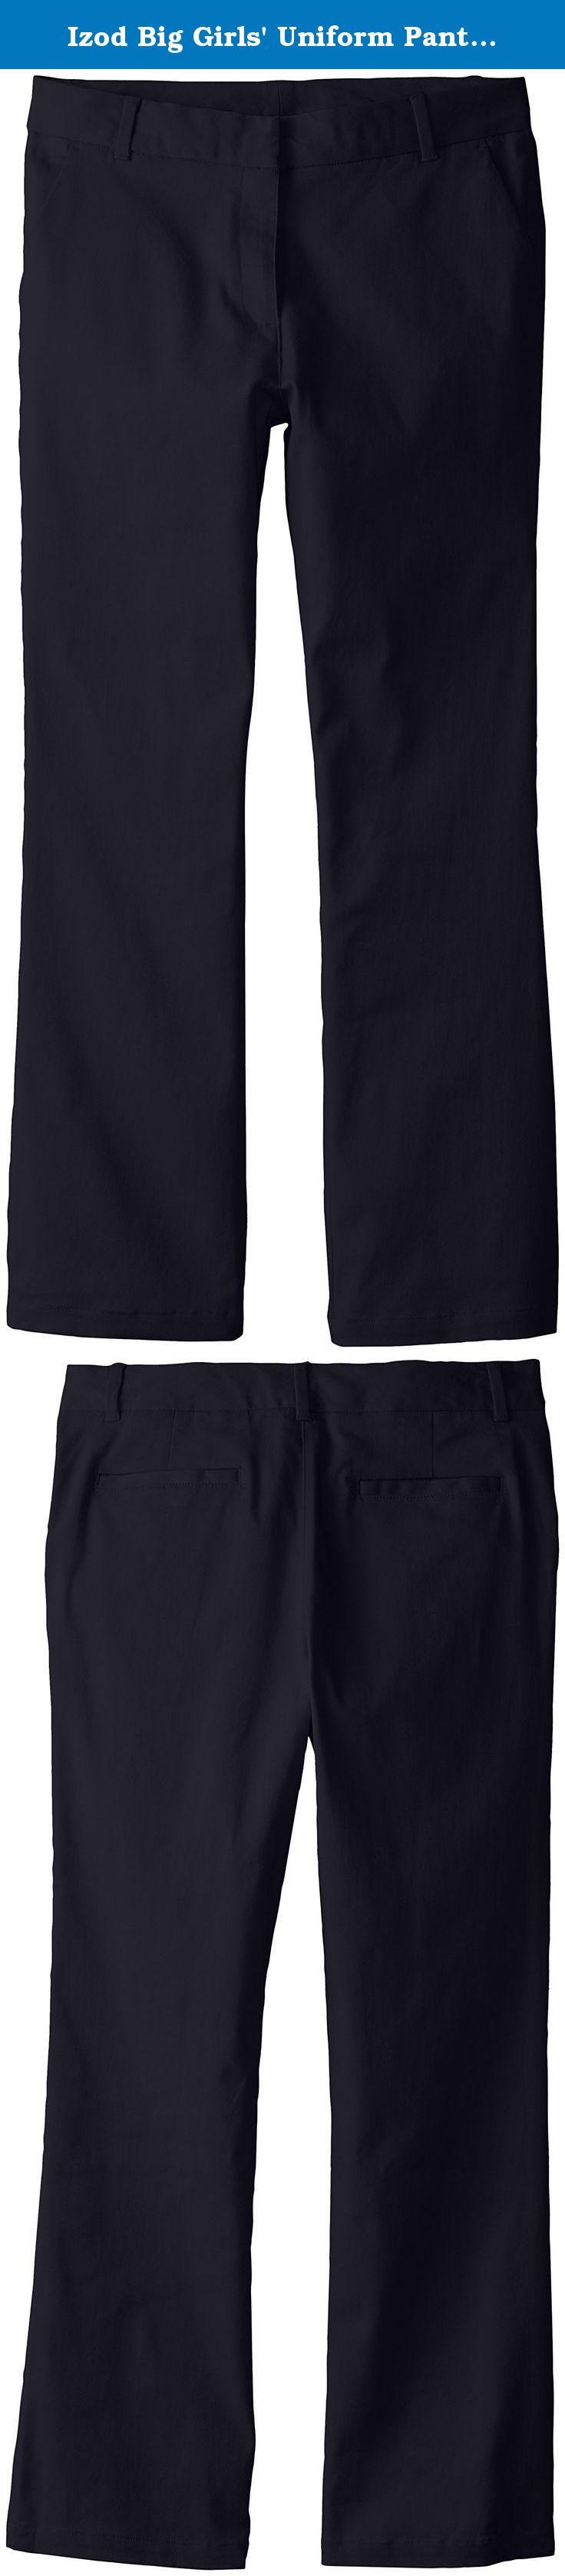 Izod Big Girls Uniform Pant Plus Size Navy 145 Izod Uniform